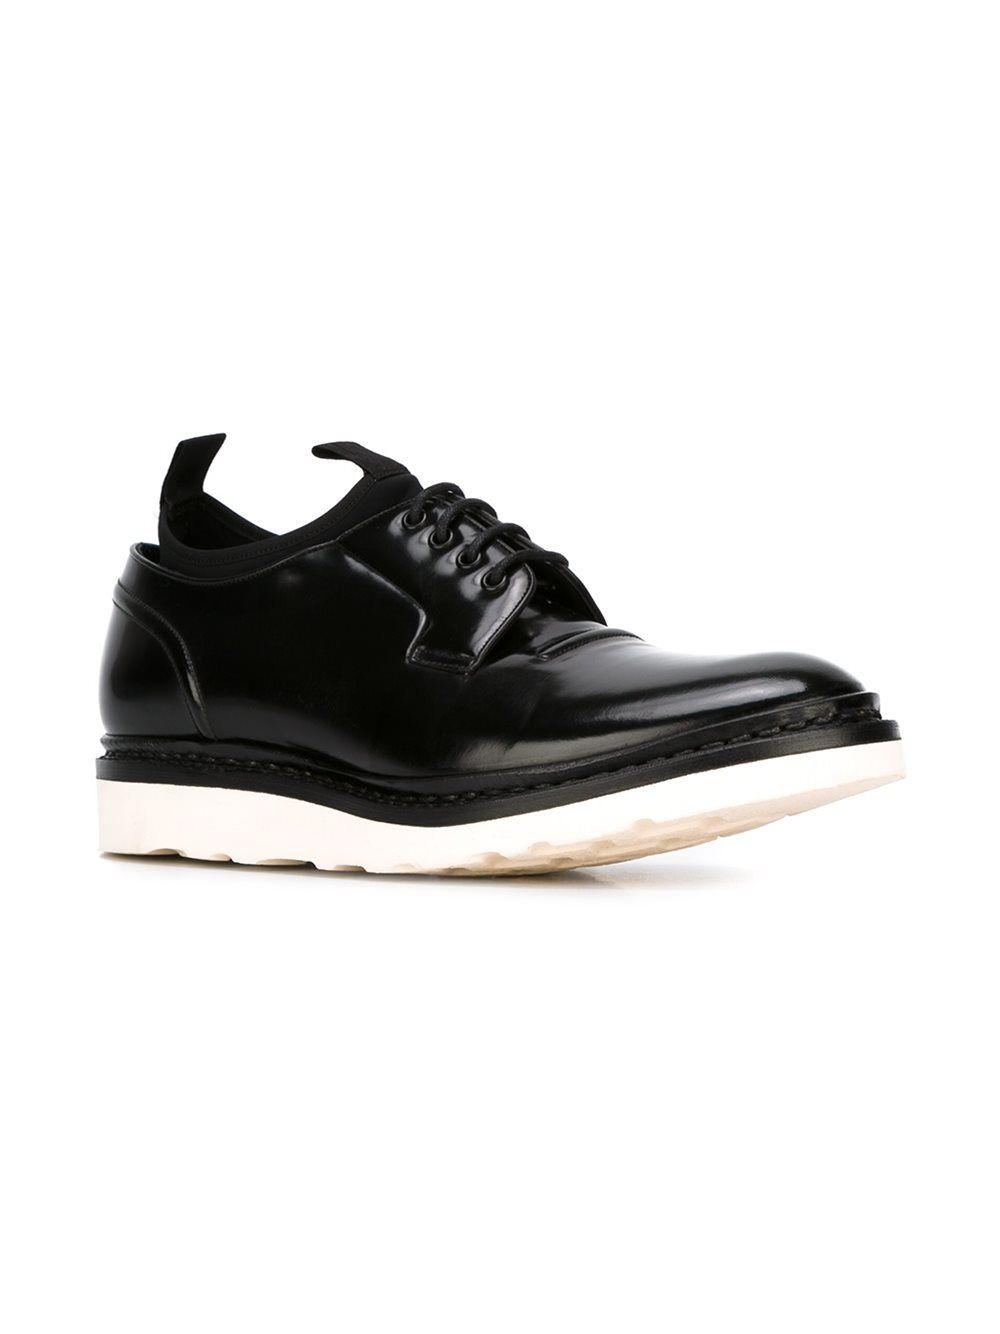 FOOTWEAR - High-tops & sneakers OAMC wBfsDM